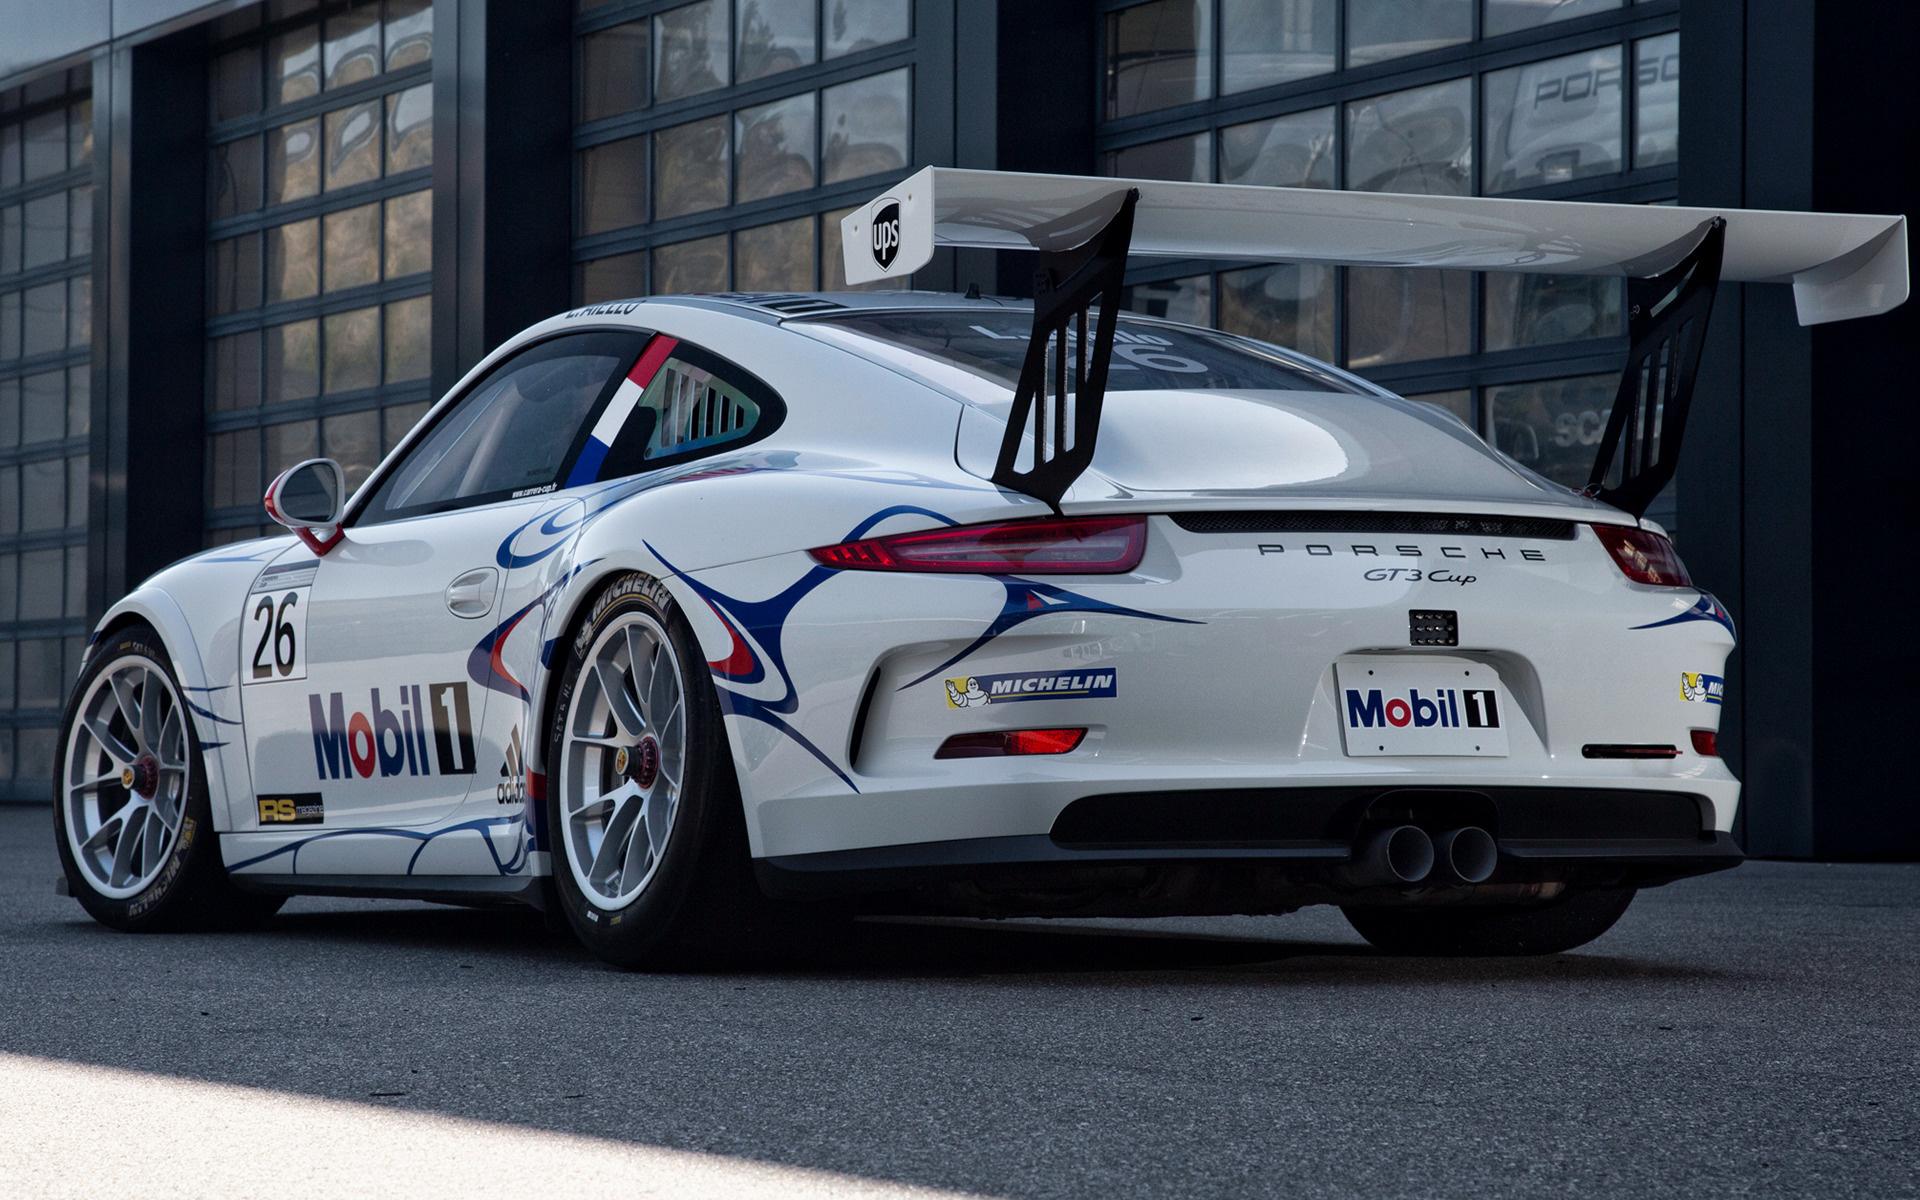 Genesis Car Wallpaper Porsche 911 Gt3 Cup 2013 Wallpapers And Hd Images Car